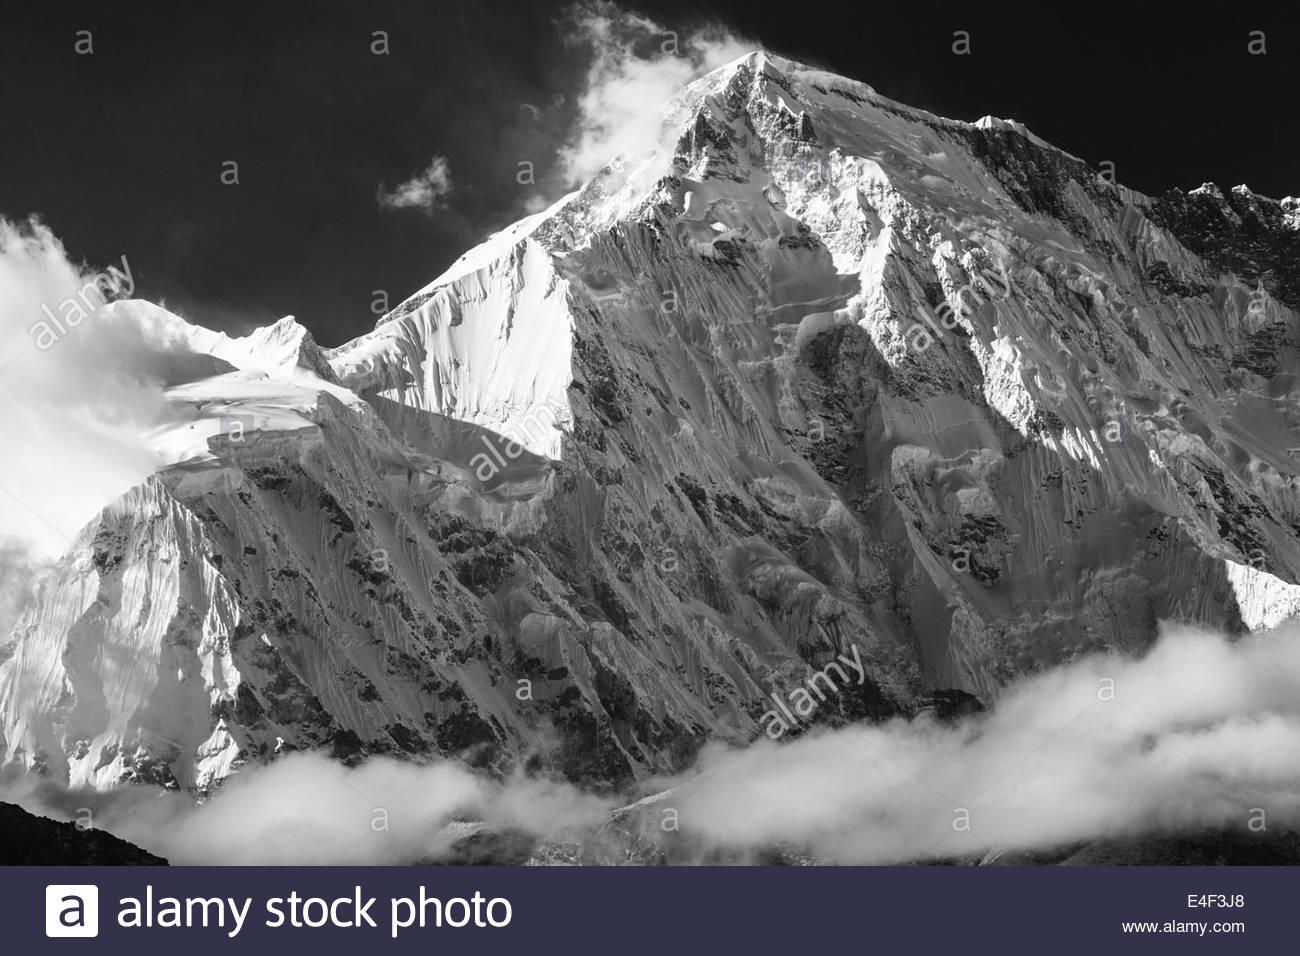 View of snowcapped Himalaya mountain - Khumbu Region - Nepal - Stock Image